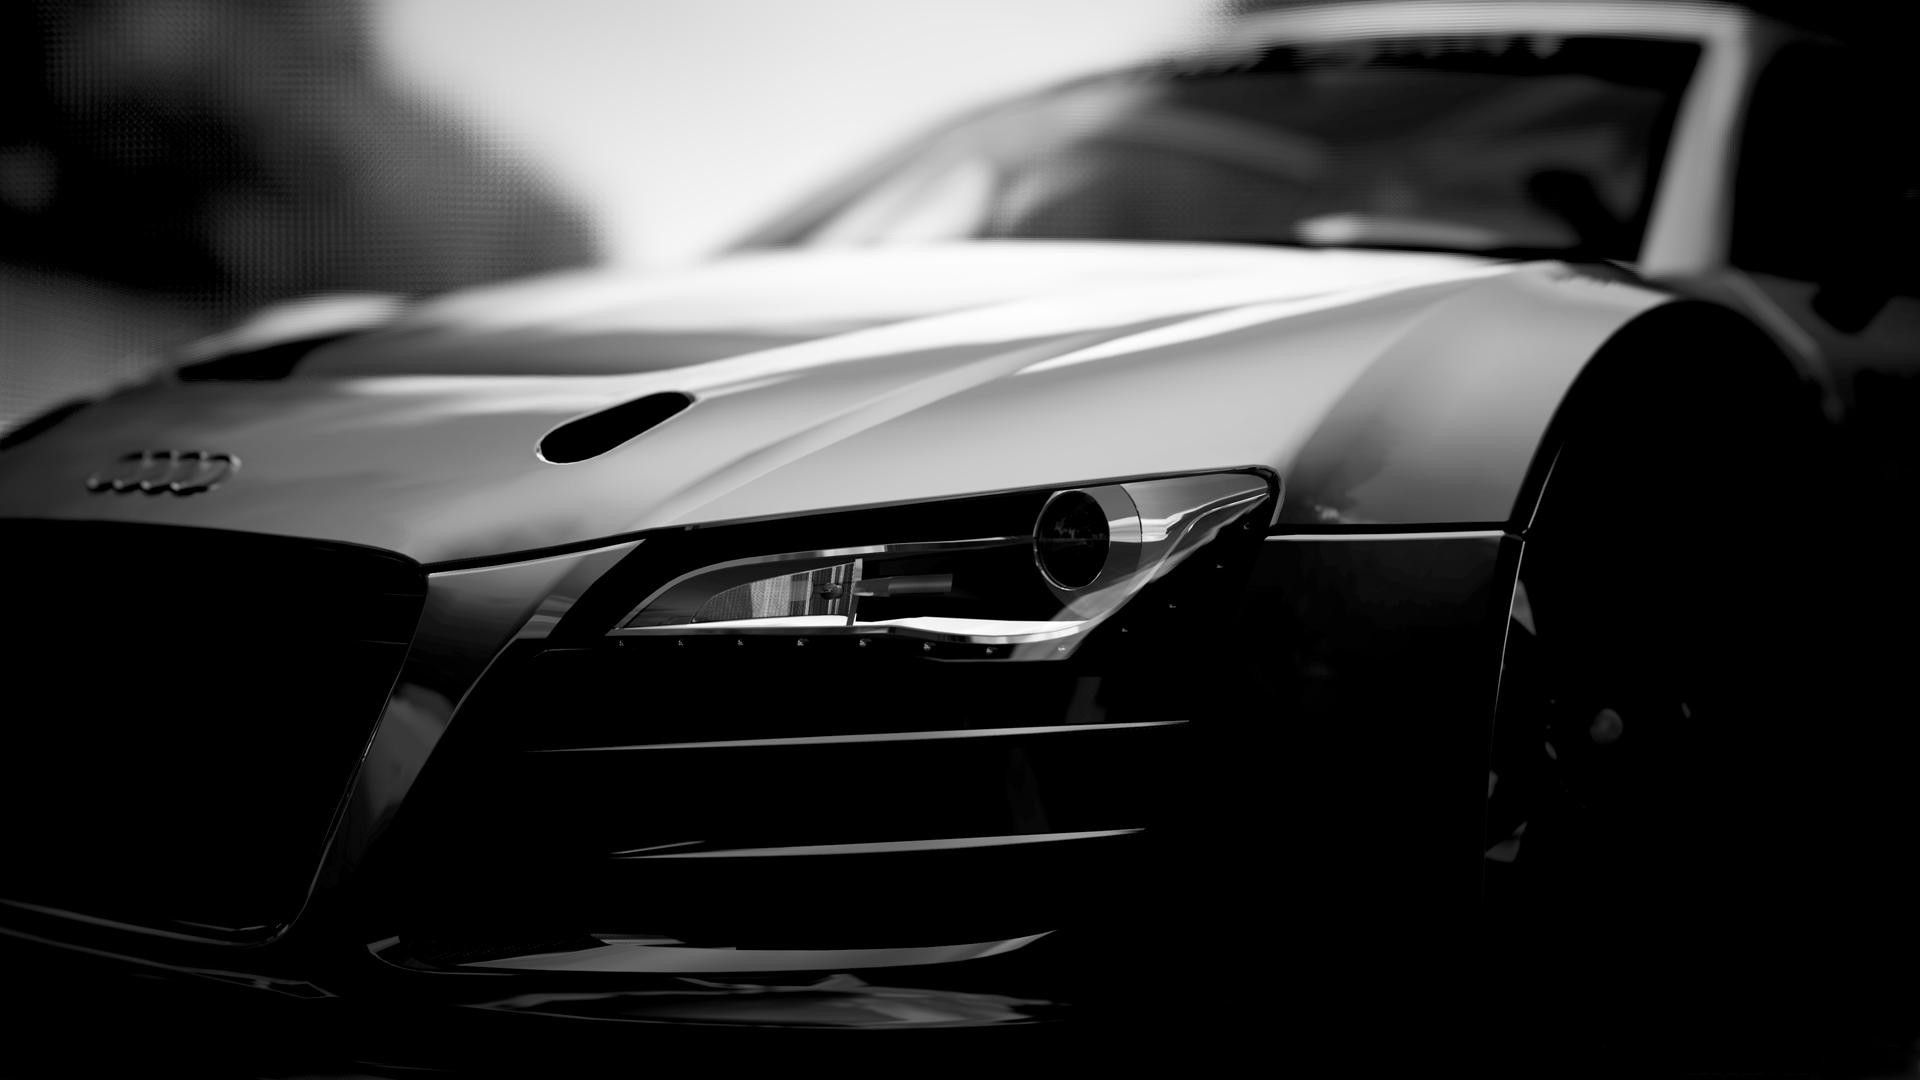 Audi R8 Wallpaper 1920x1080 85 Images